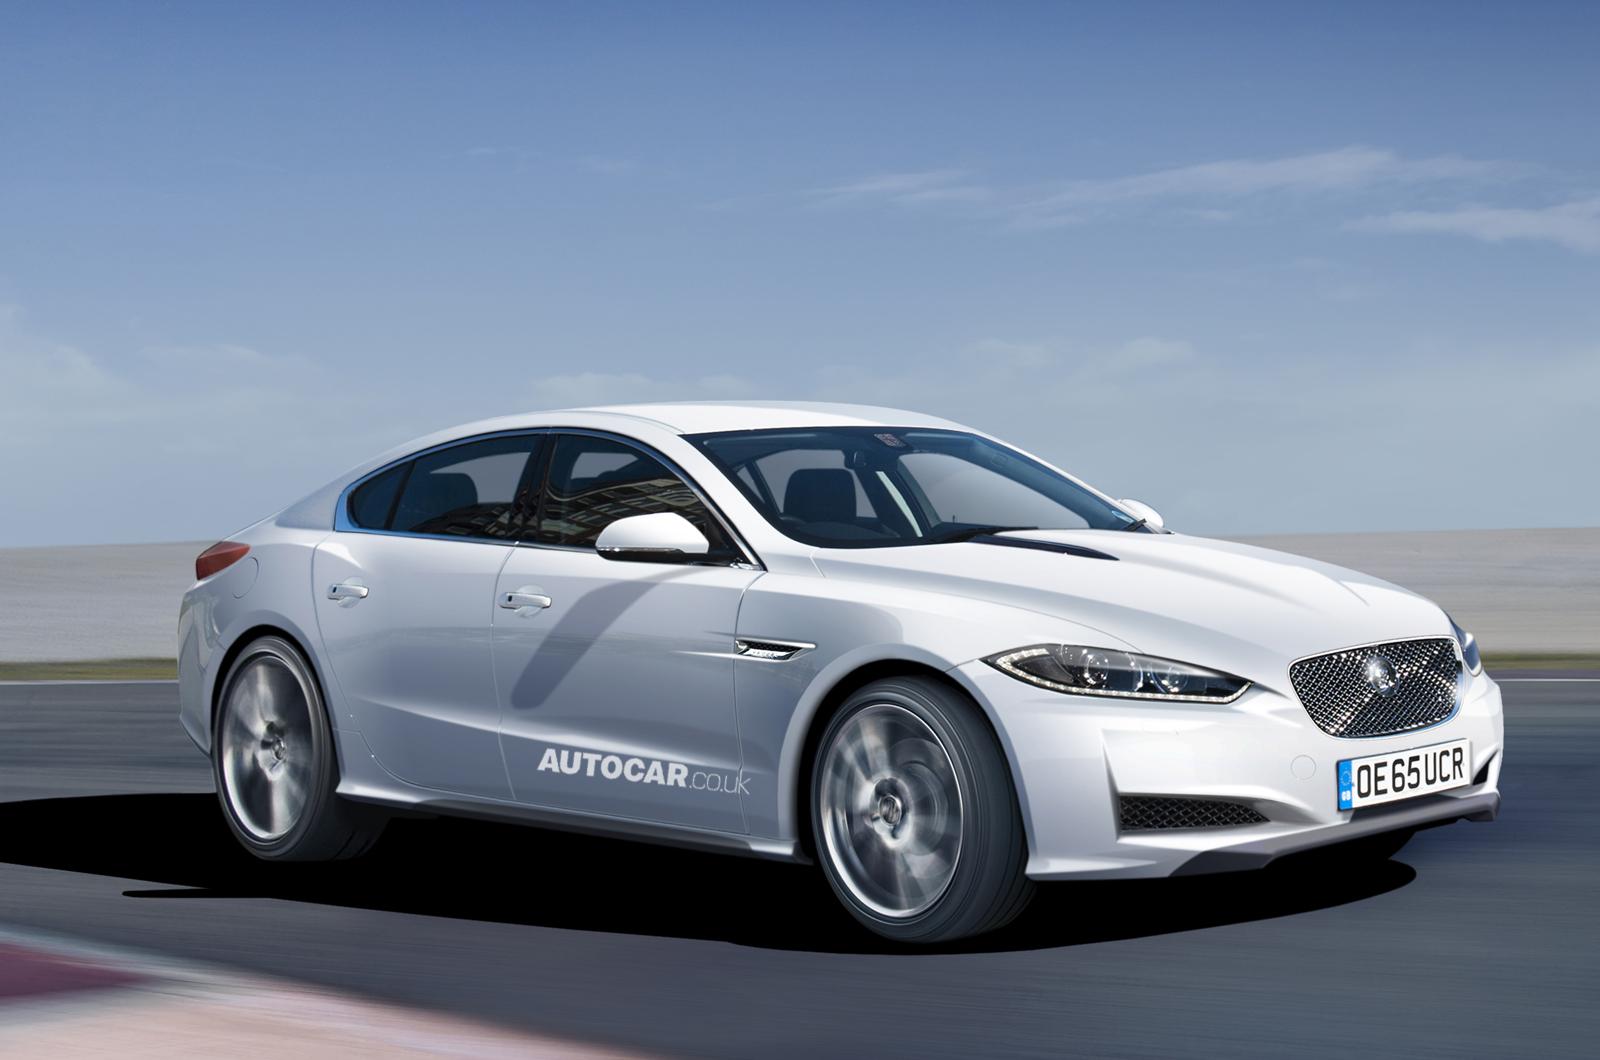 Small Jaguar Sedan Will Have to be 'Extraordinary' to Succeed - GTspirit